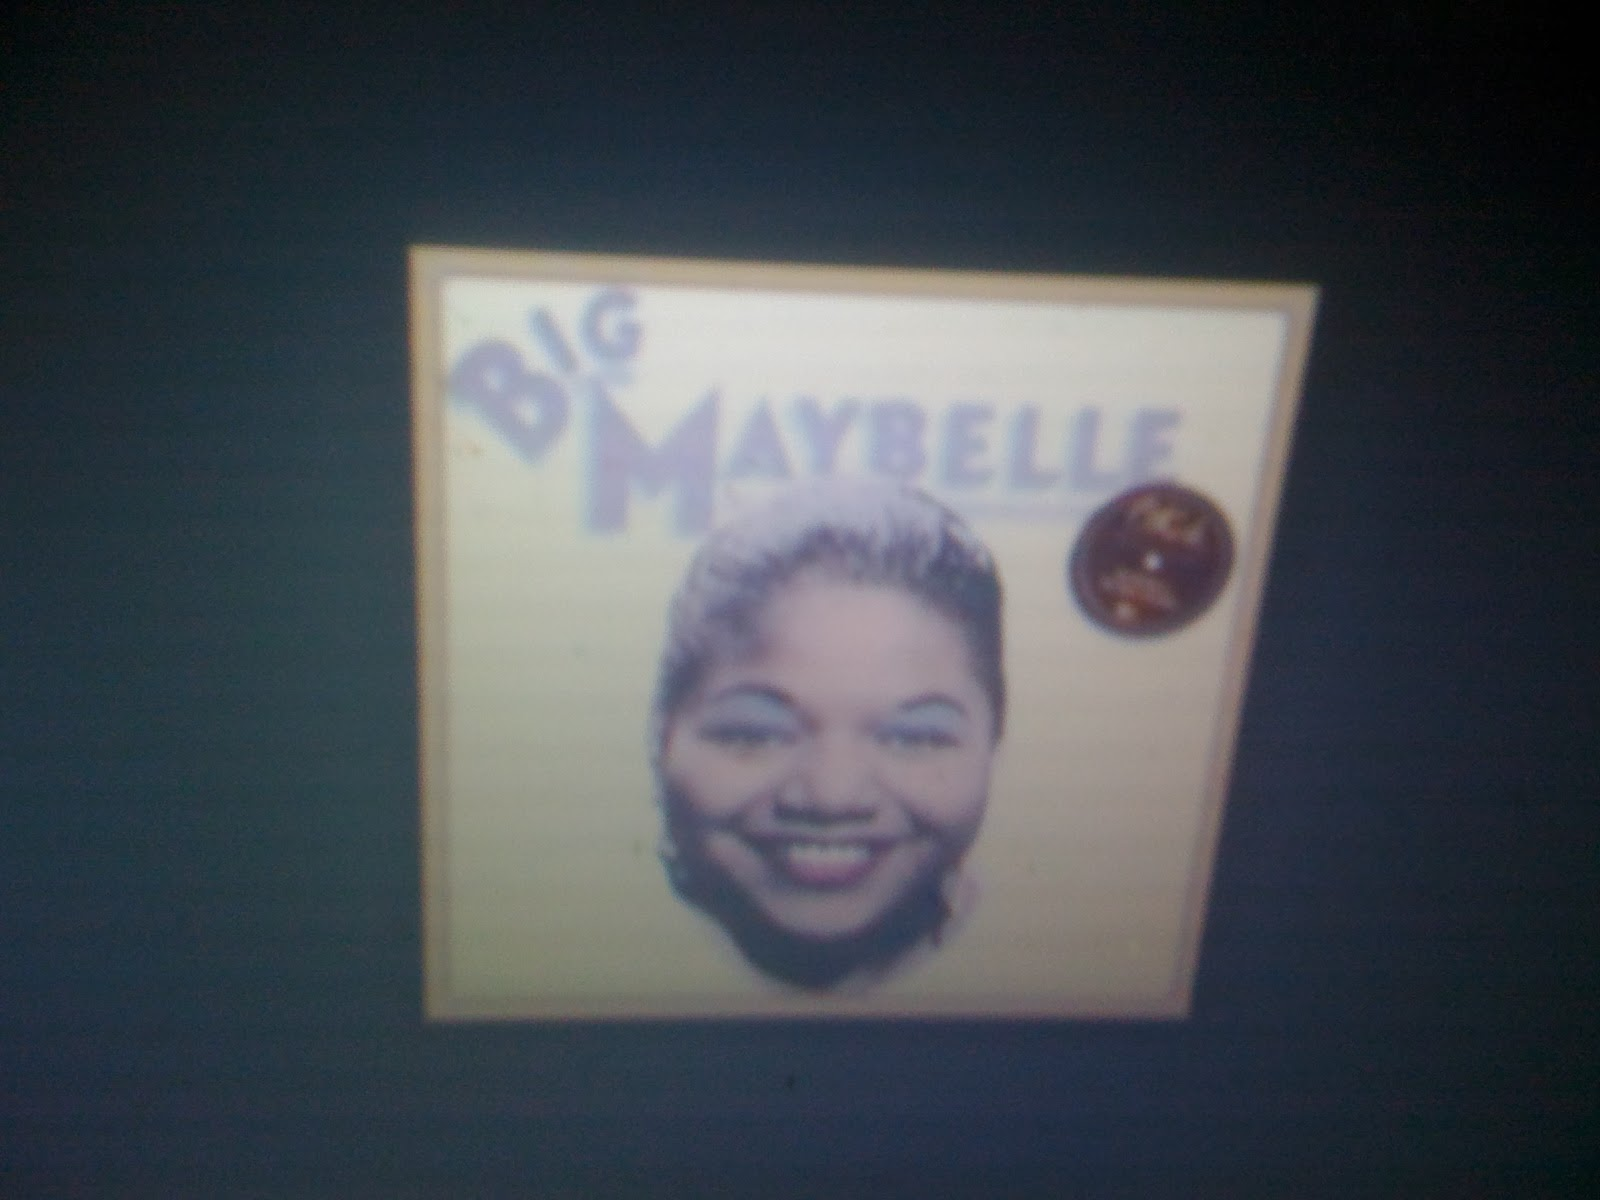 Big Maybelle 96 Tears